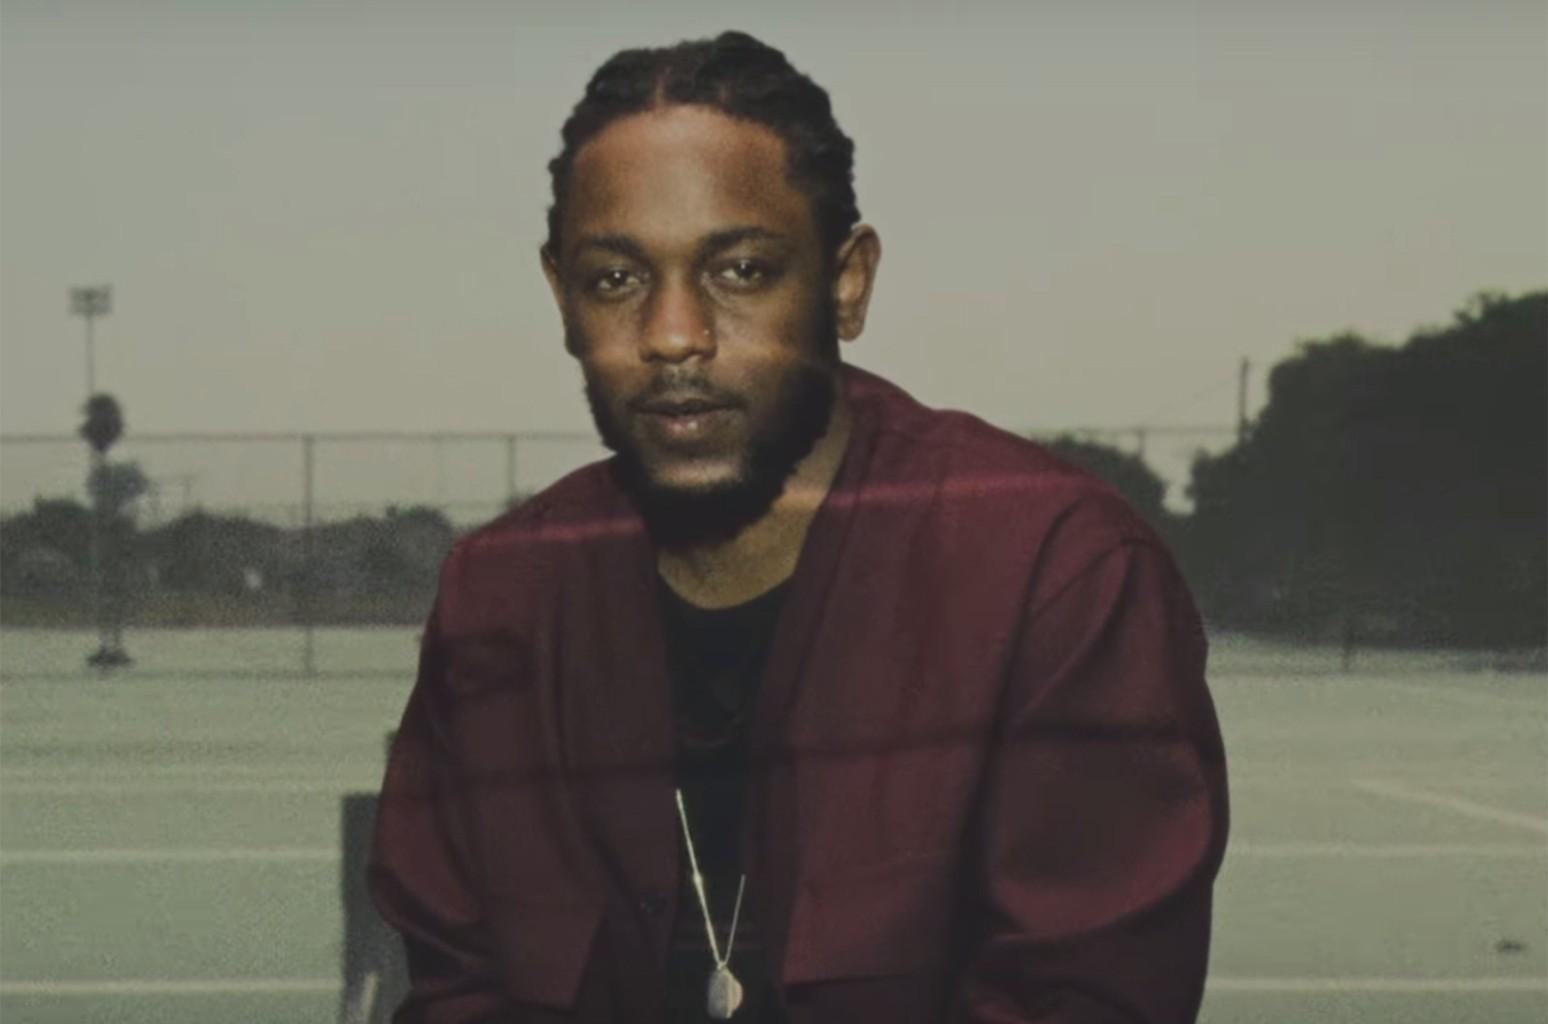 Kendrick Lamar in an ad for Reebok.